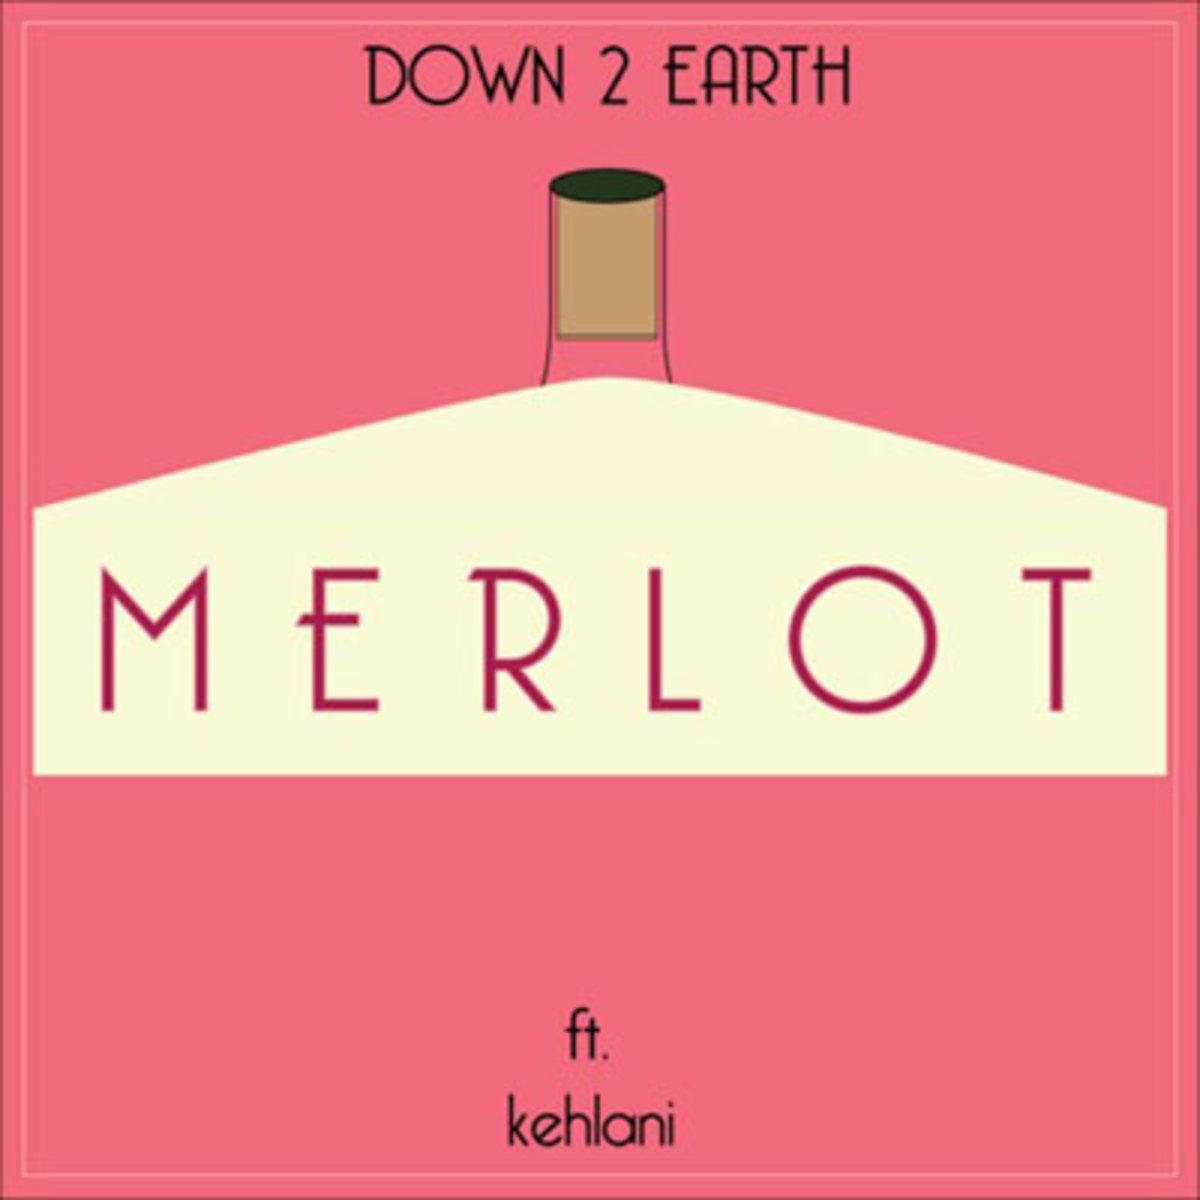 down2earth-merlot.jpg